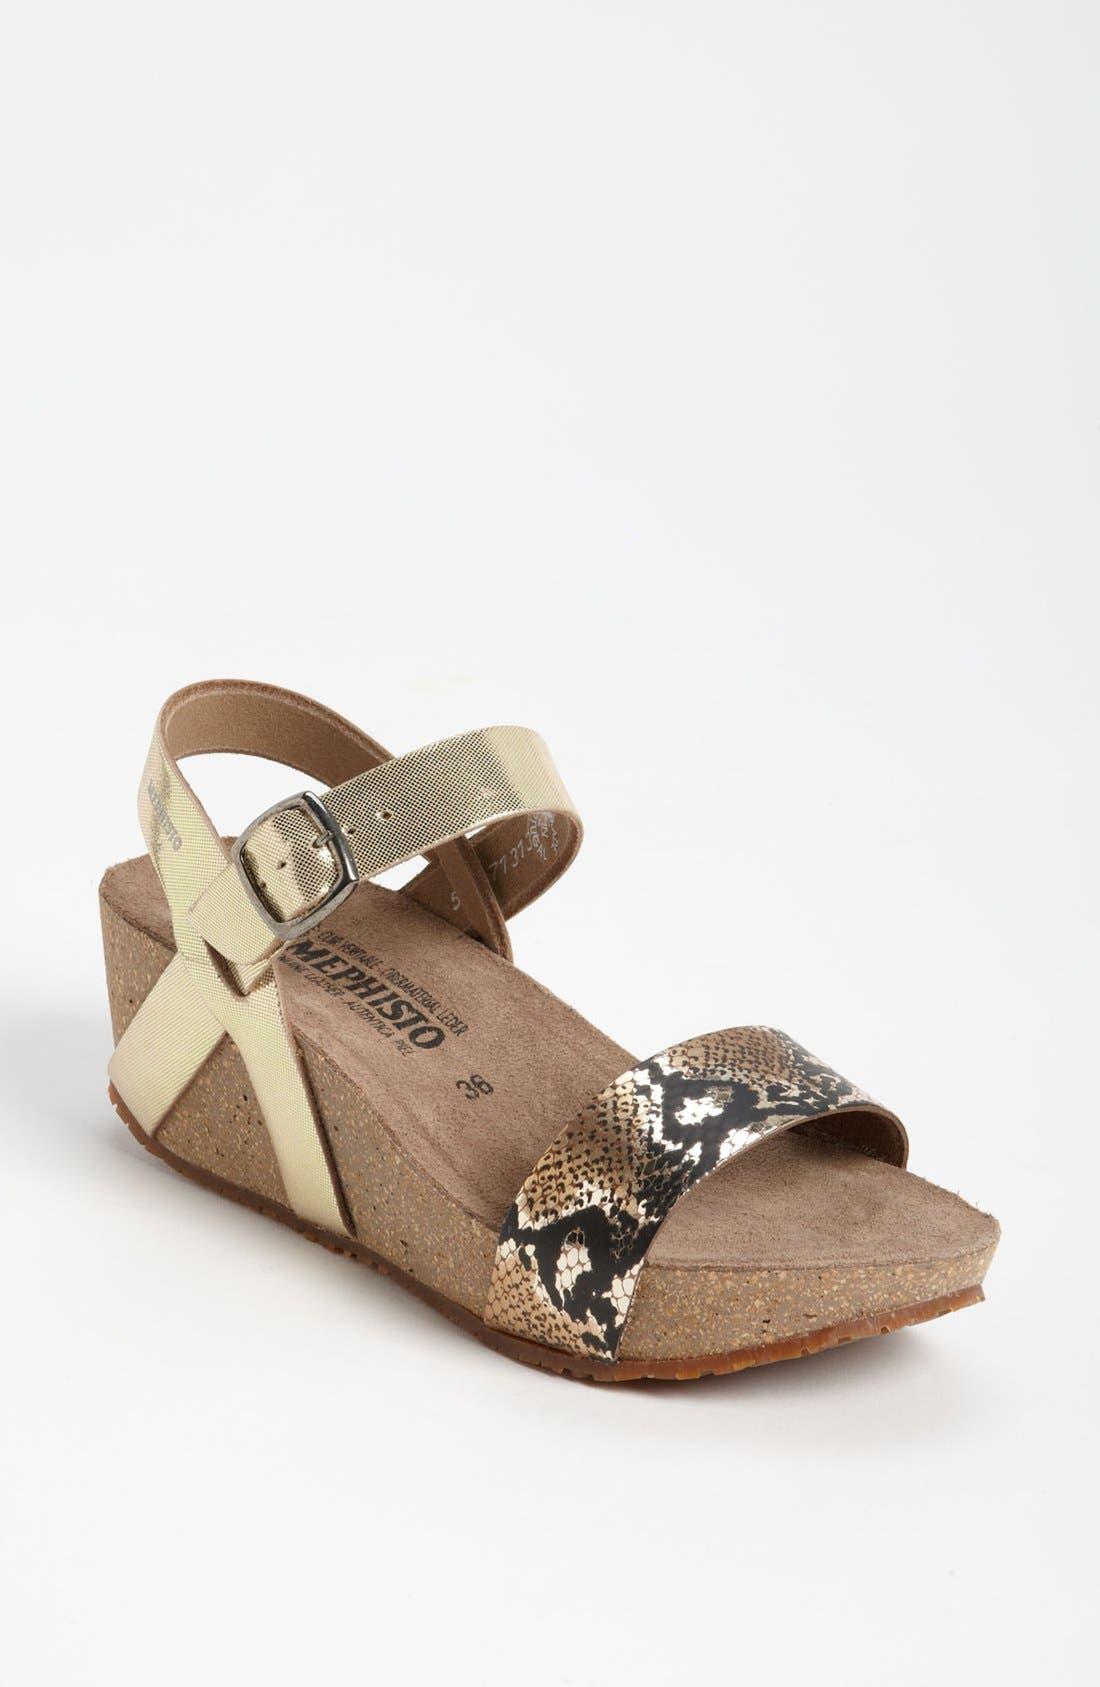 Alternate Image 1 Selected - Mephisto 'Fafa' Sandal